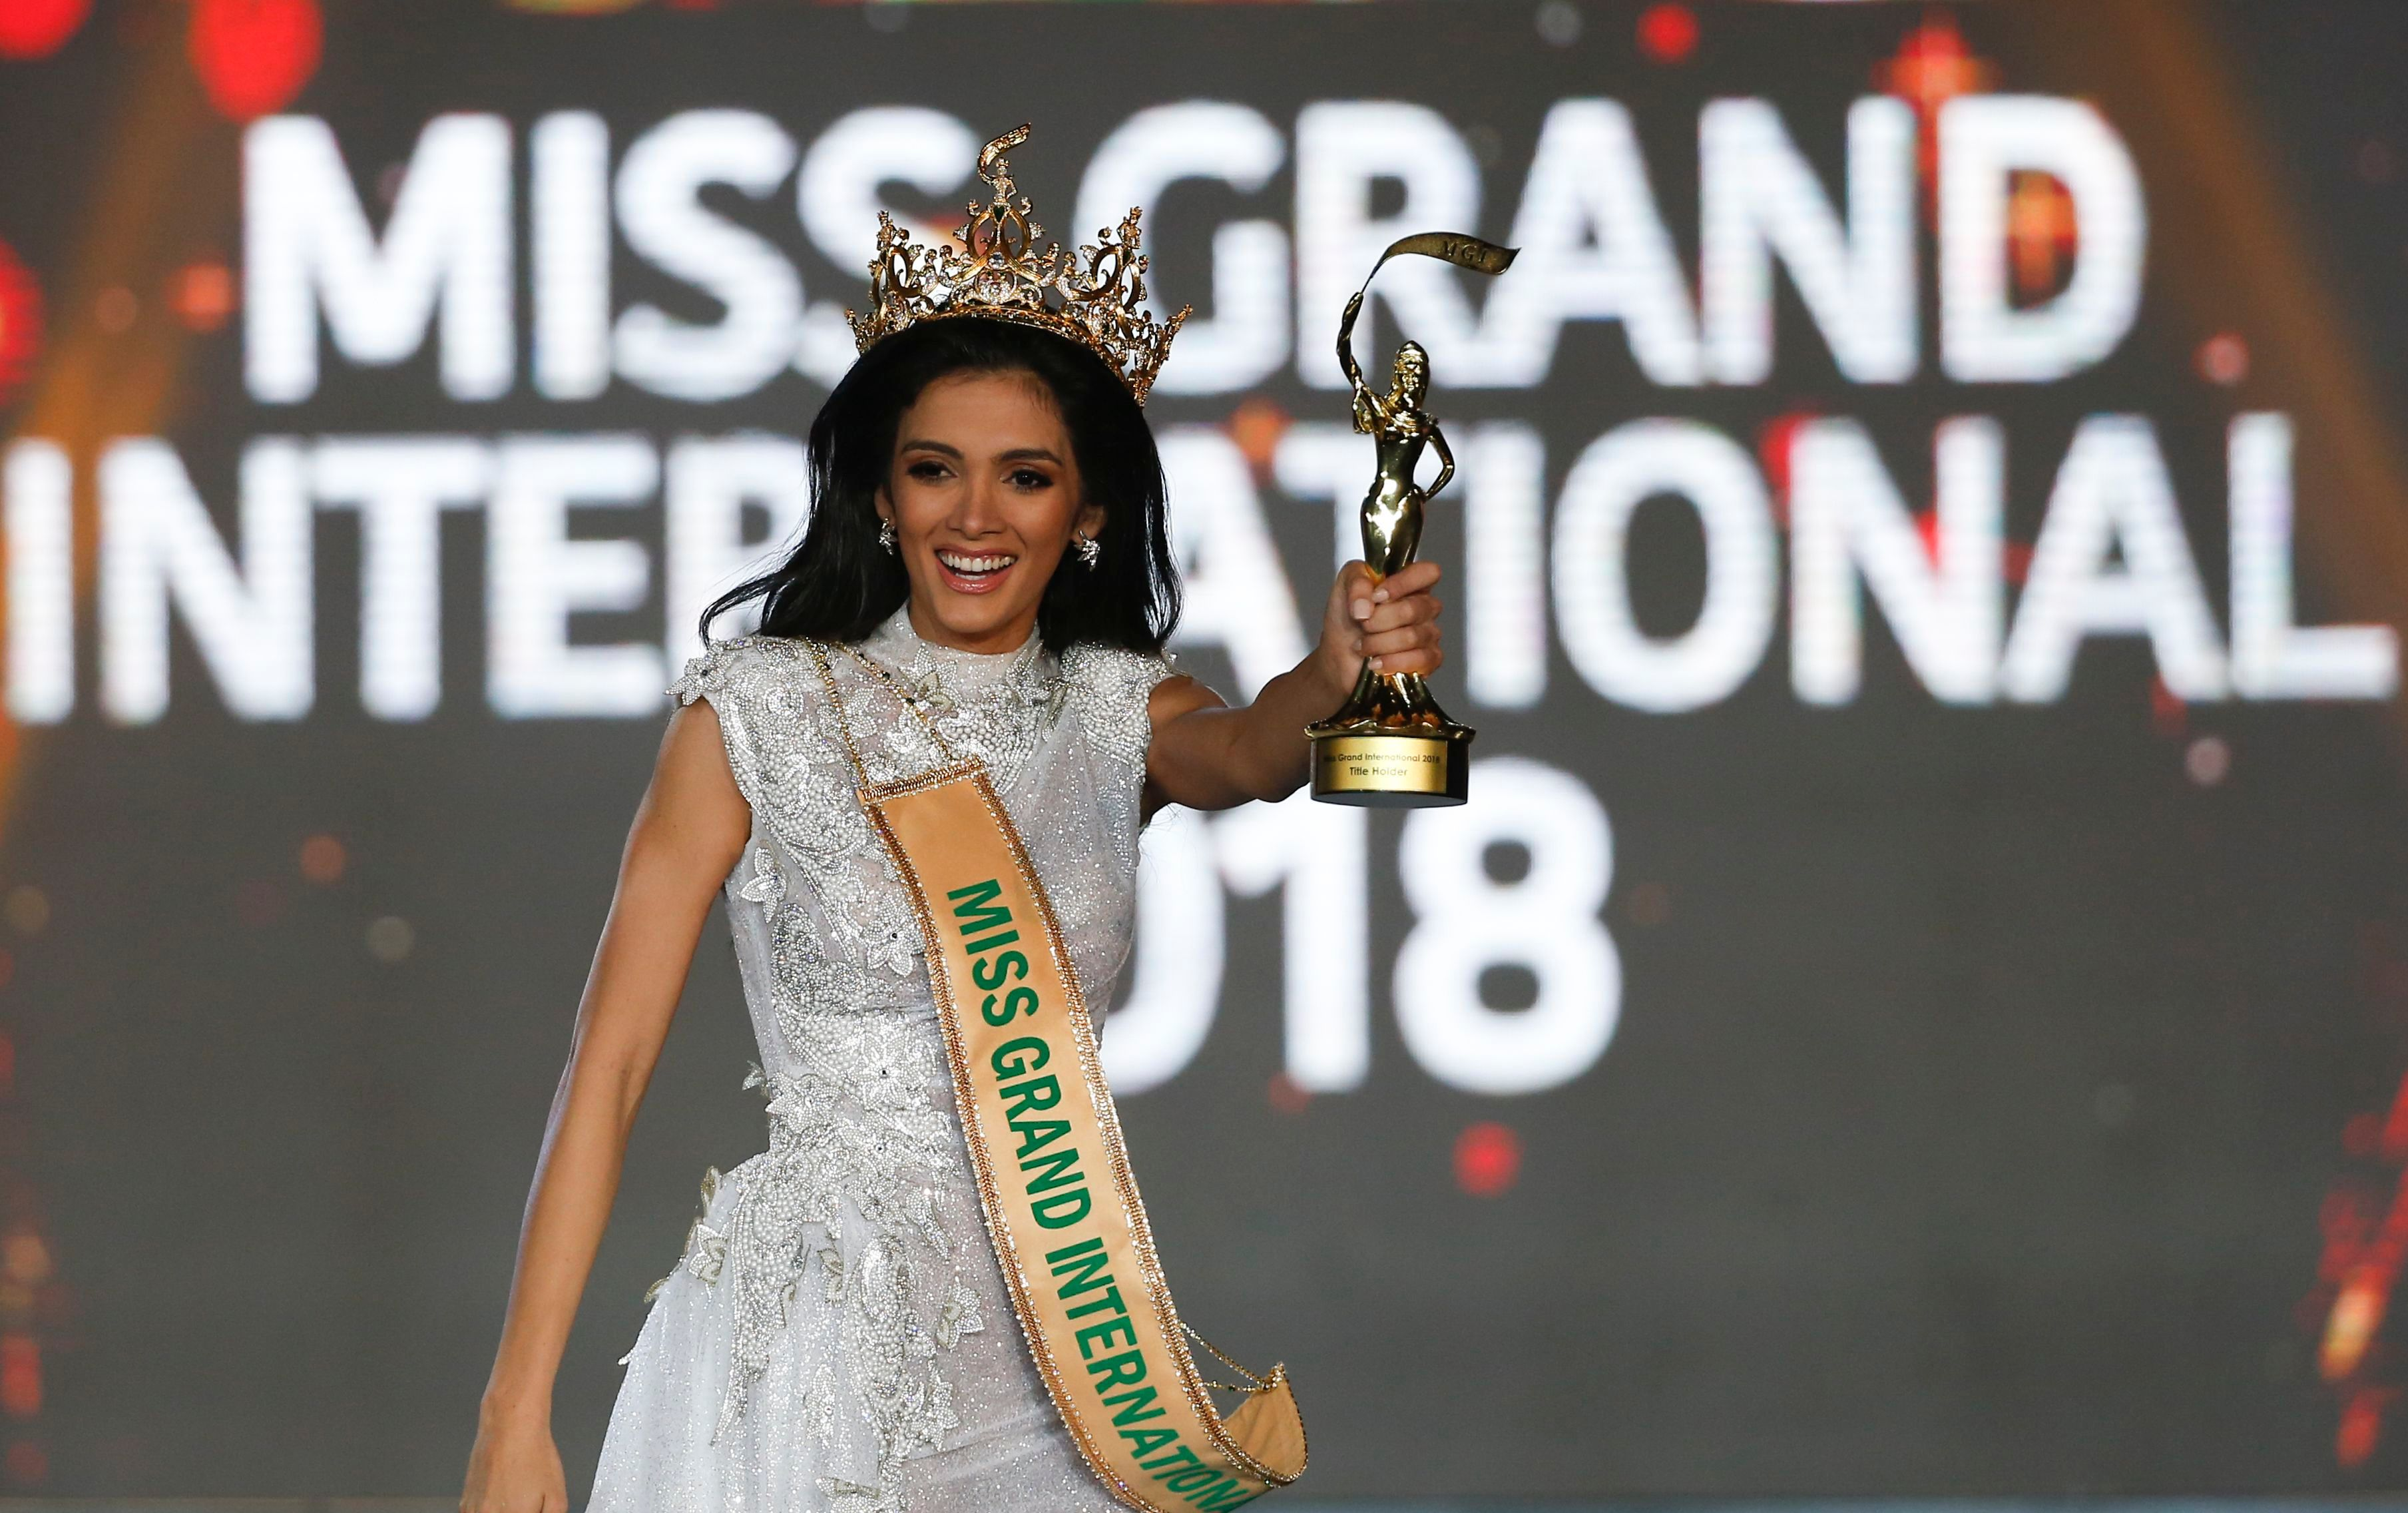 Clara Sosa Miss Paraguay